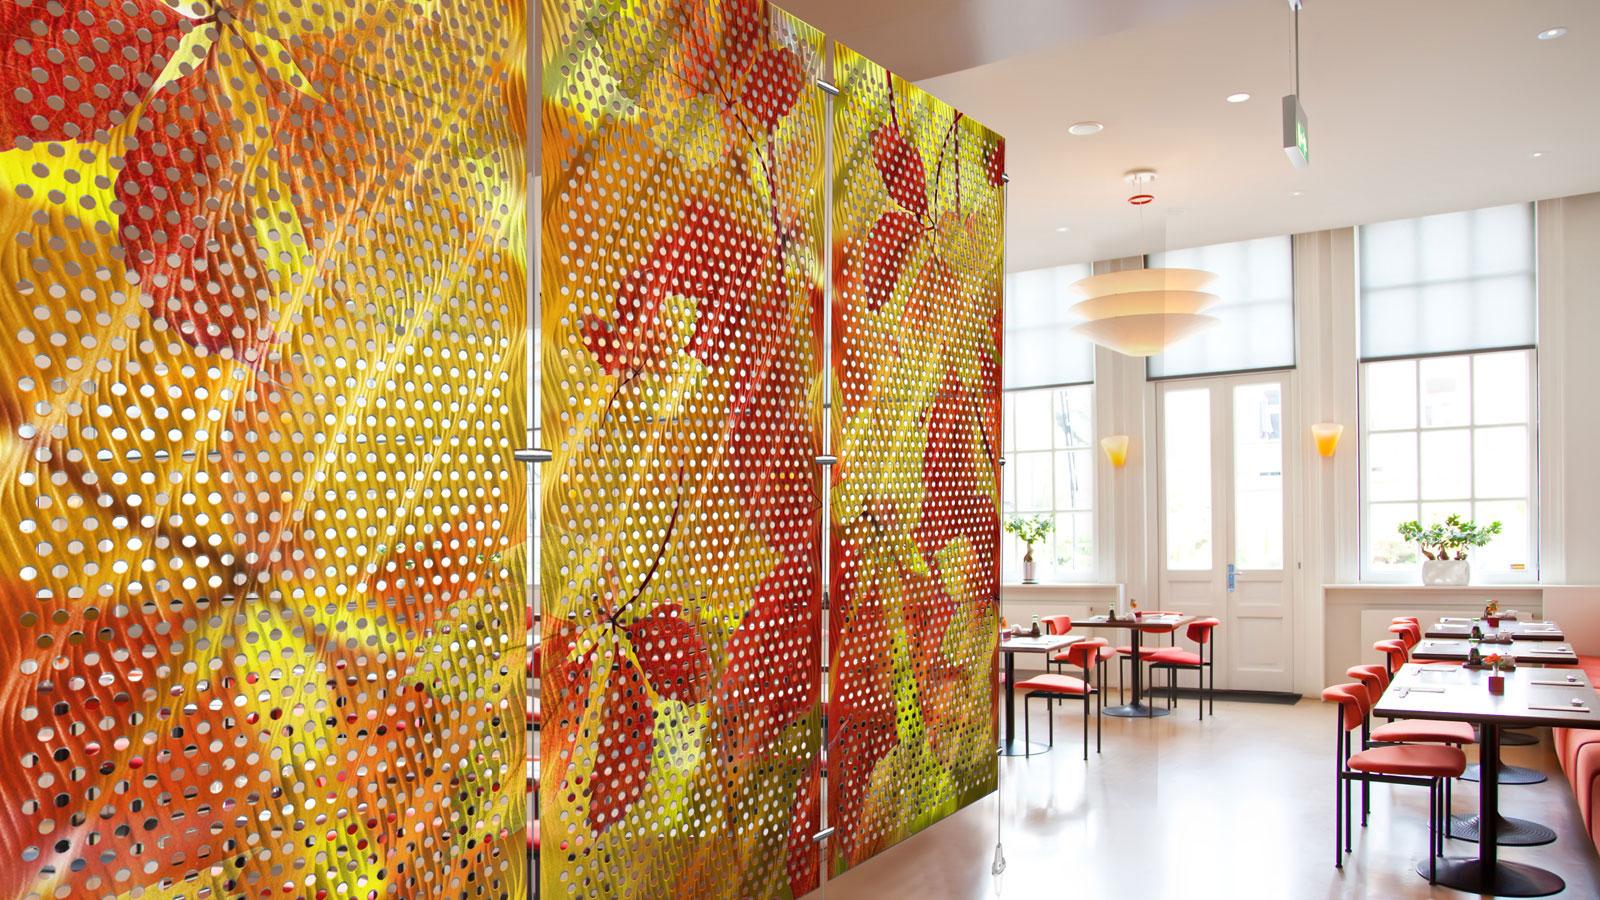 Metal Room Divider, Perforated, Moz Designer Metals, Digital Imagery